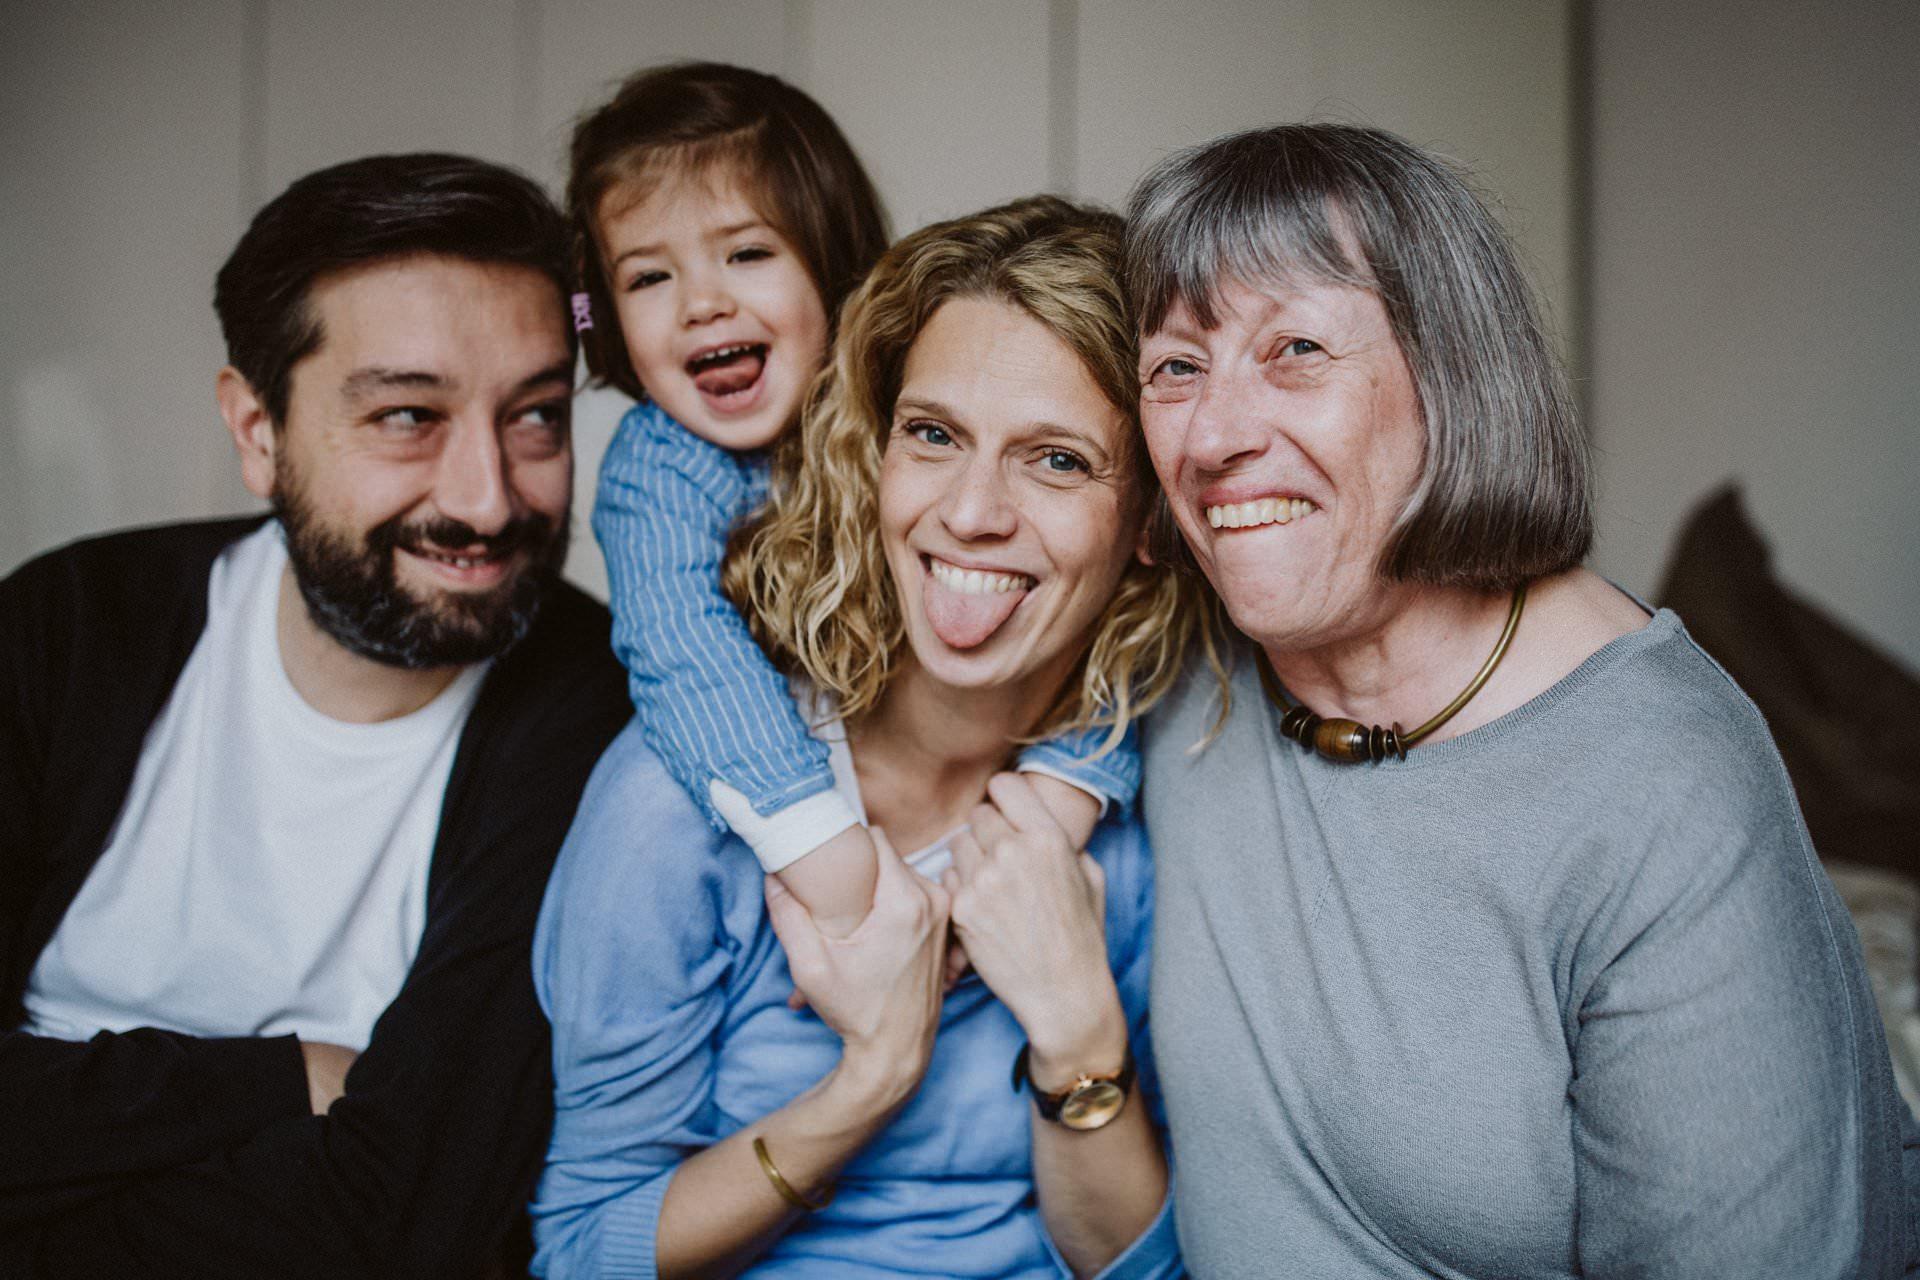 Familienfotograf Prenzlauer Berg